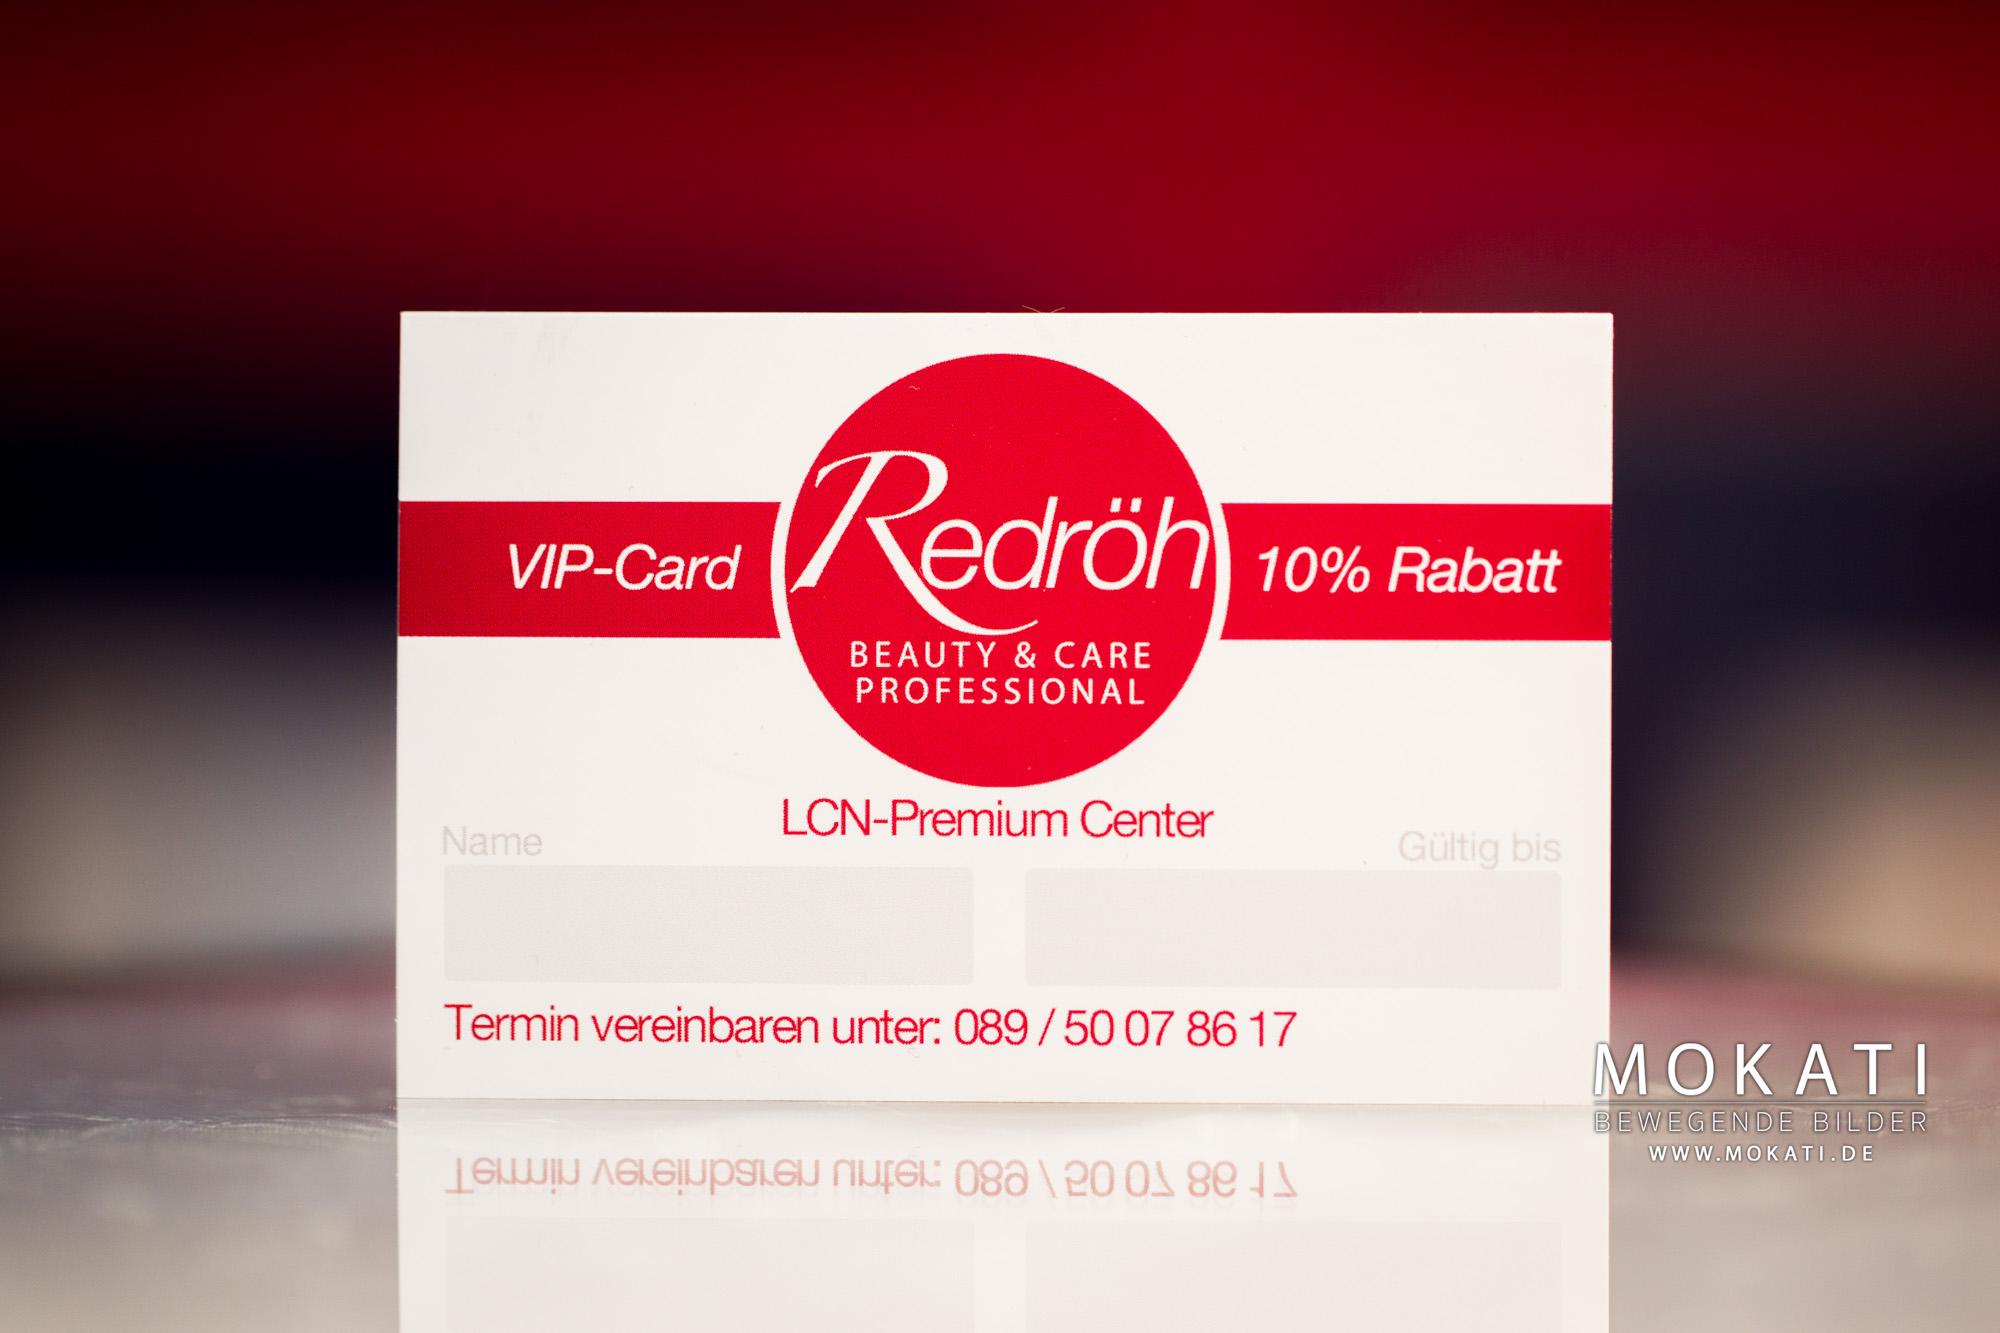 Redröh Beauty & Care professional Kundenkarte für 10% Rabatt